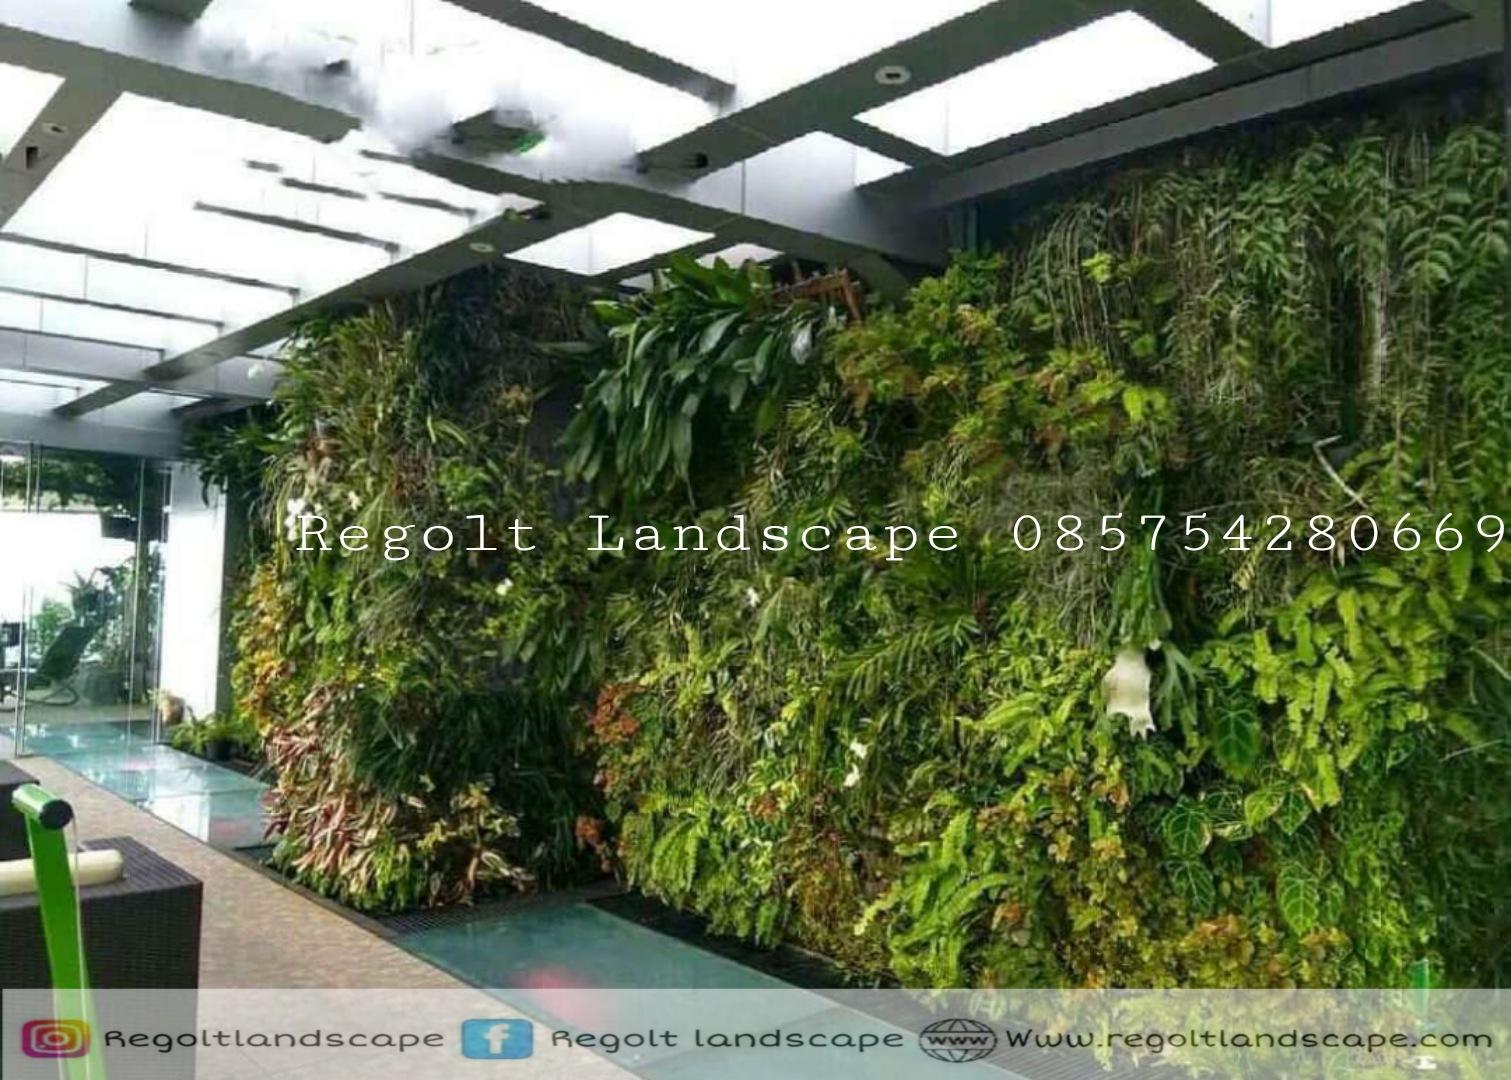 Jasa Pembuatan Vertical Garden Di Surabaya